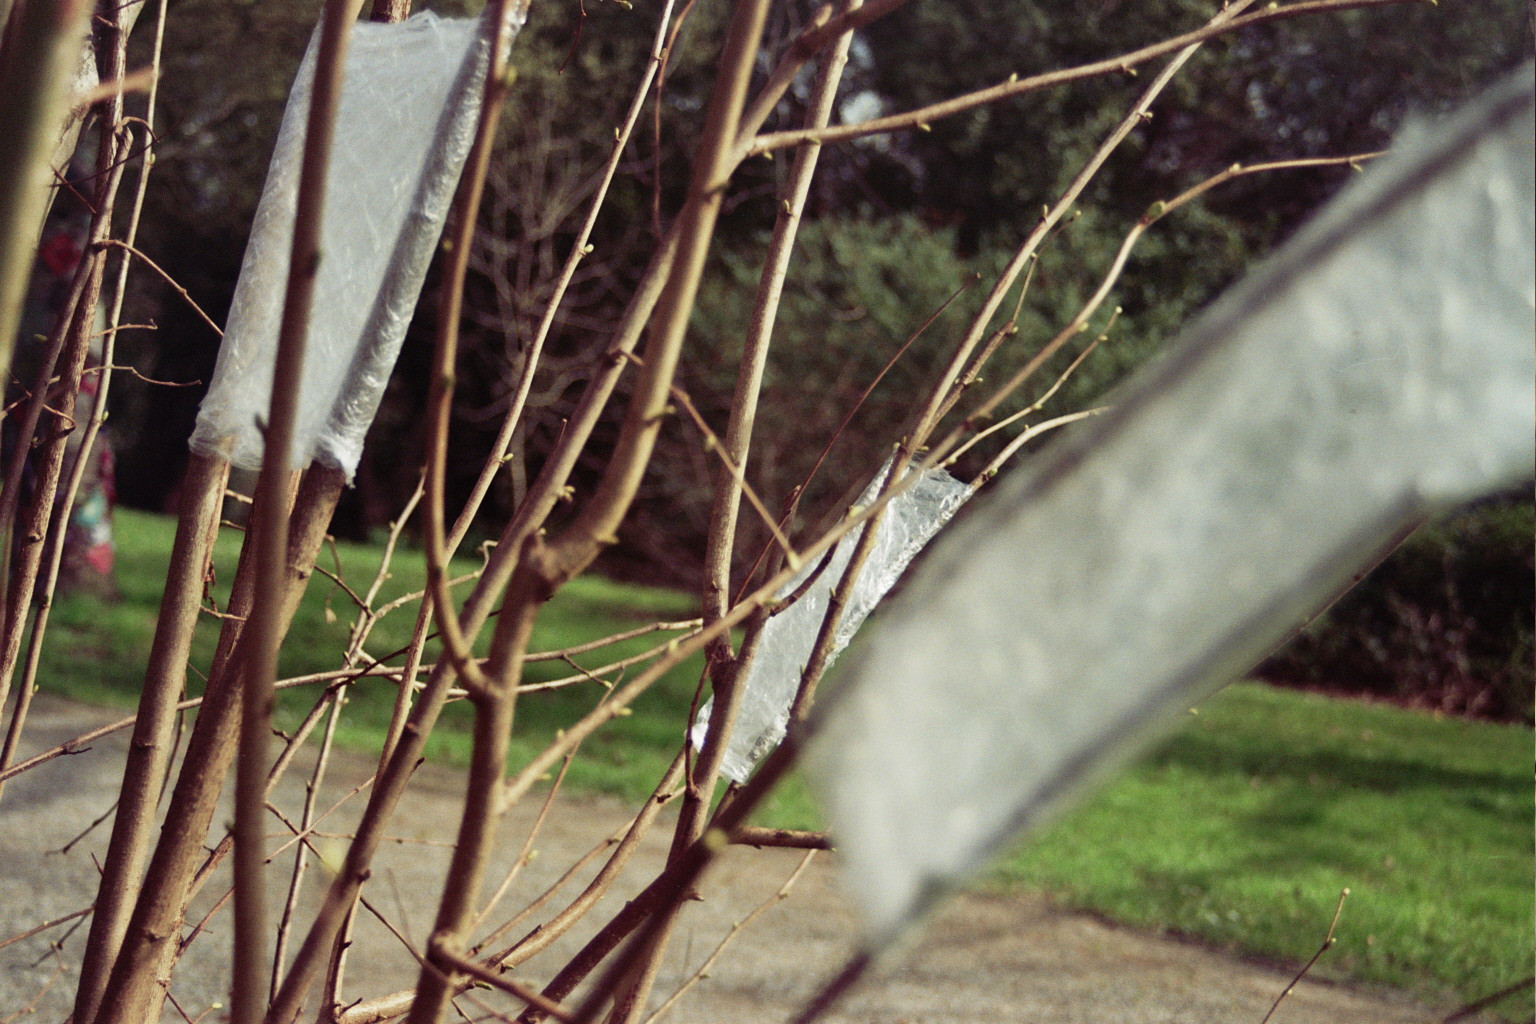 Prueba en árbol (1).jpg